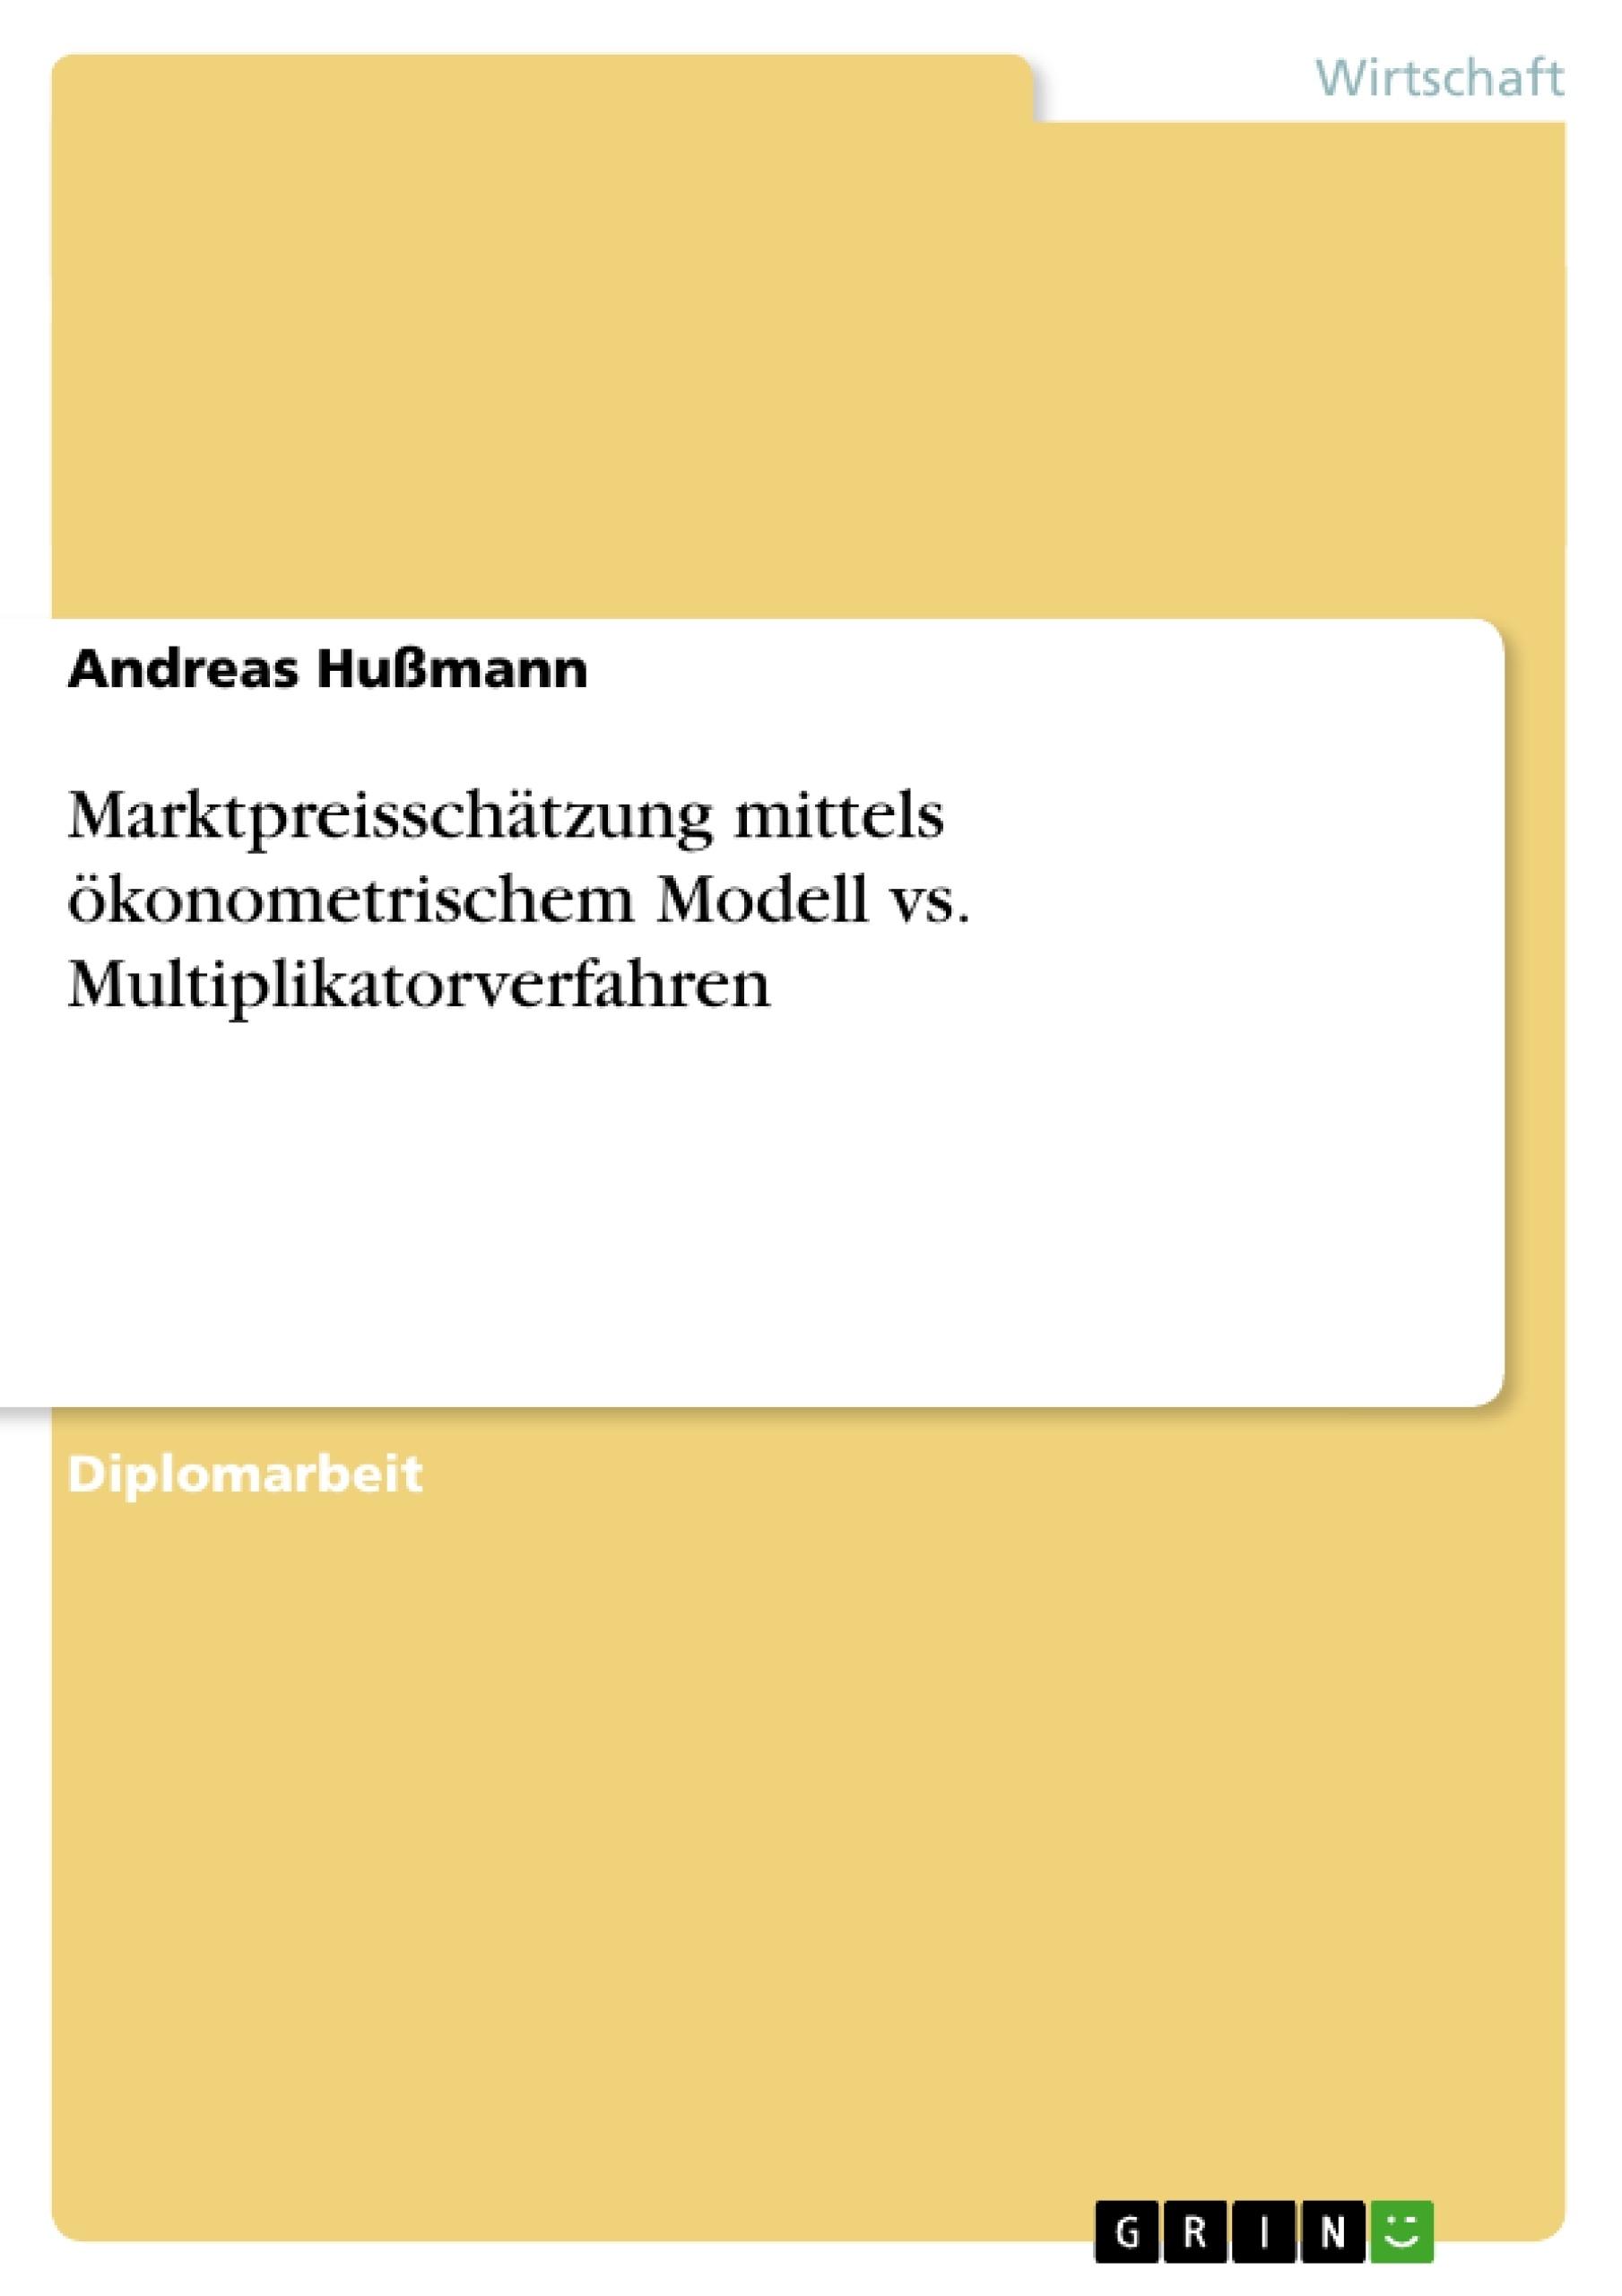 Titel: Marktpreisschätzung mittels ökonometrischem Modell vs. Multiplikatorverfahren